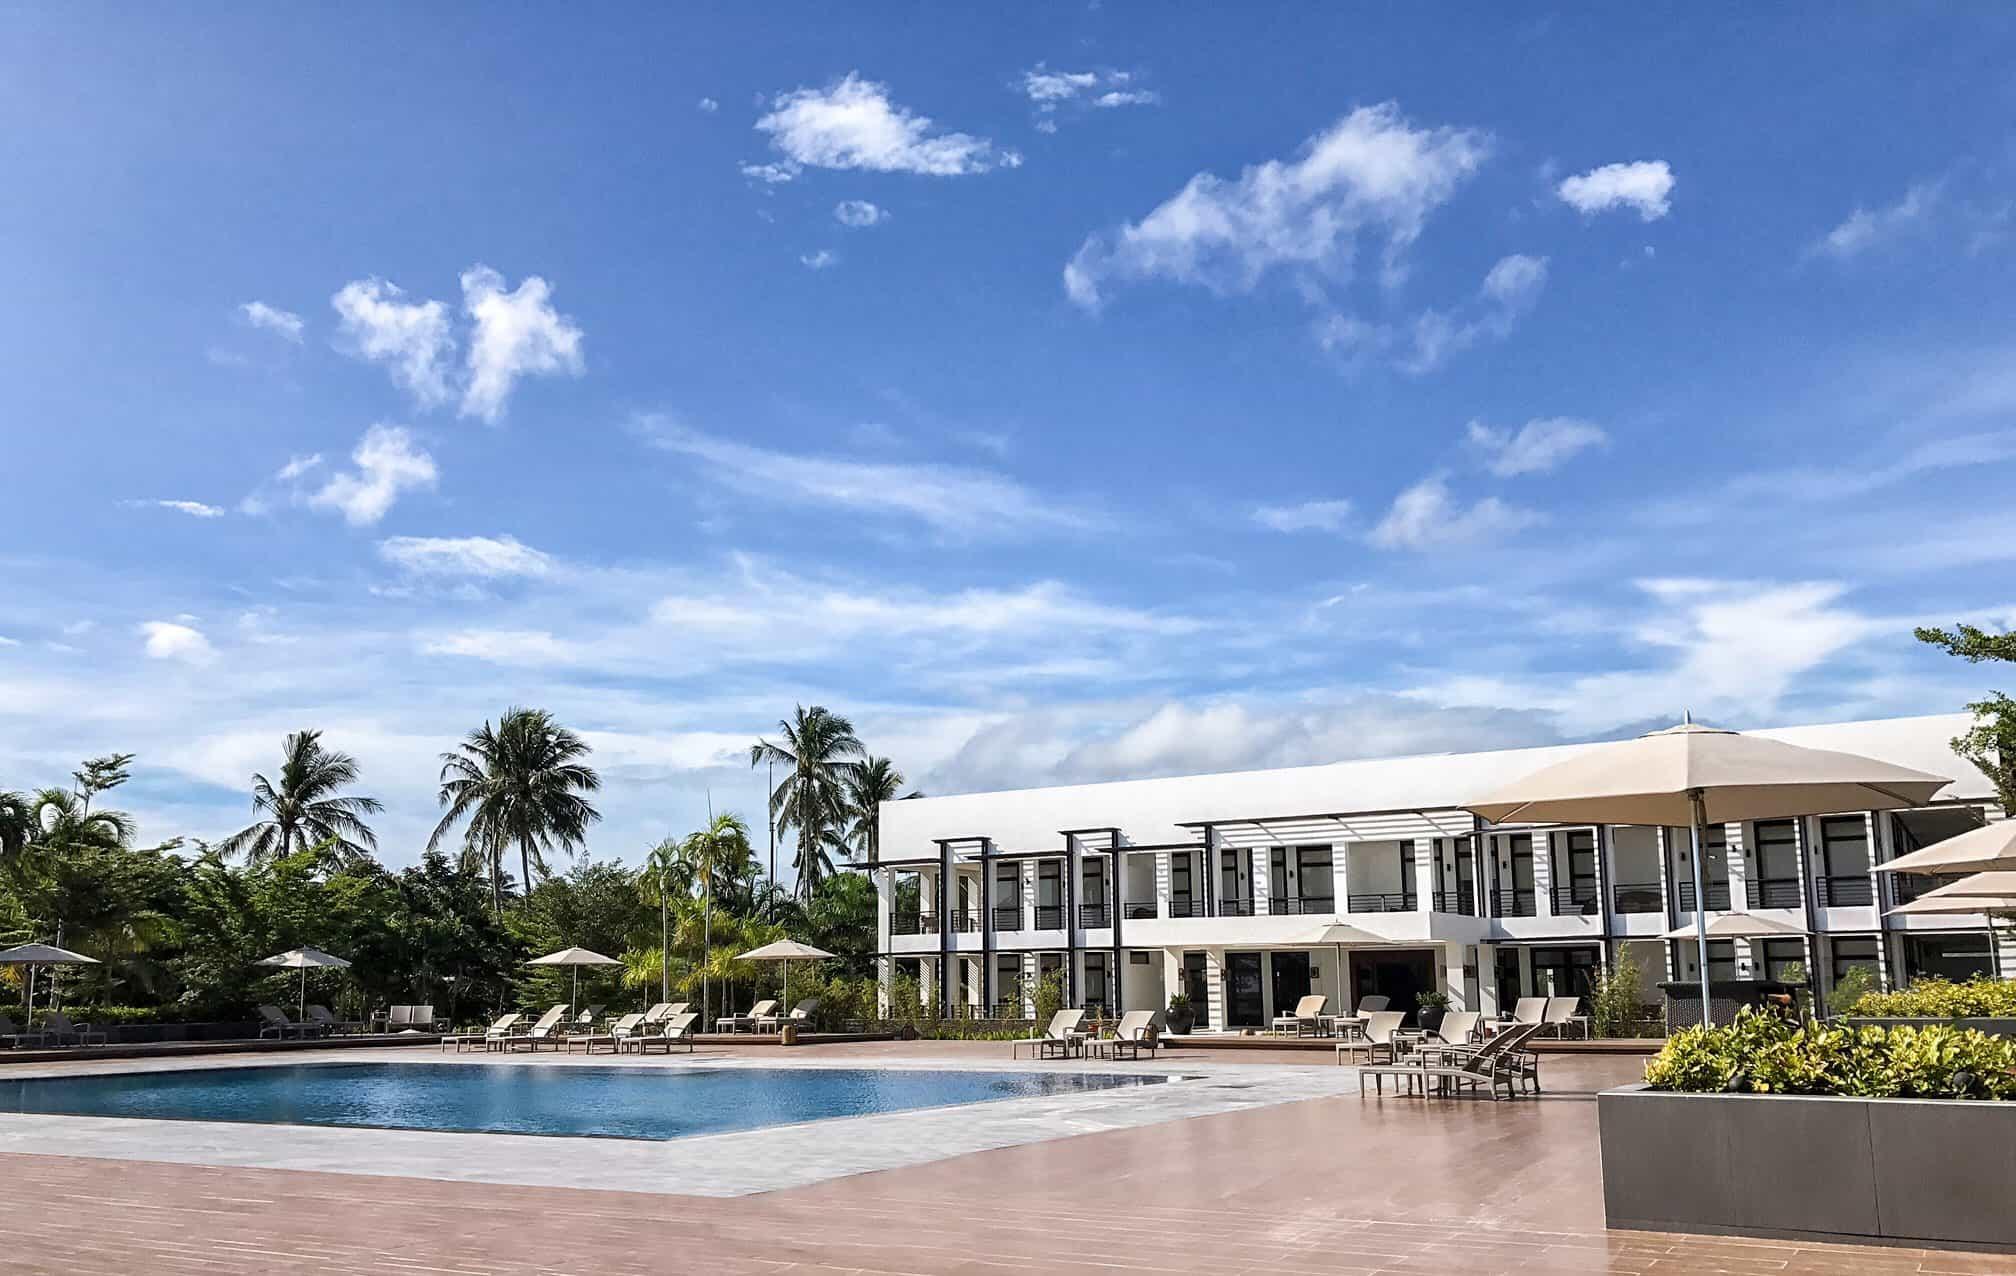 Kandaya Resort Daanbantayan Cebu (1)